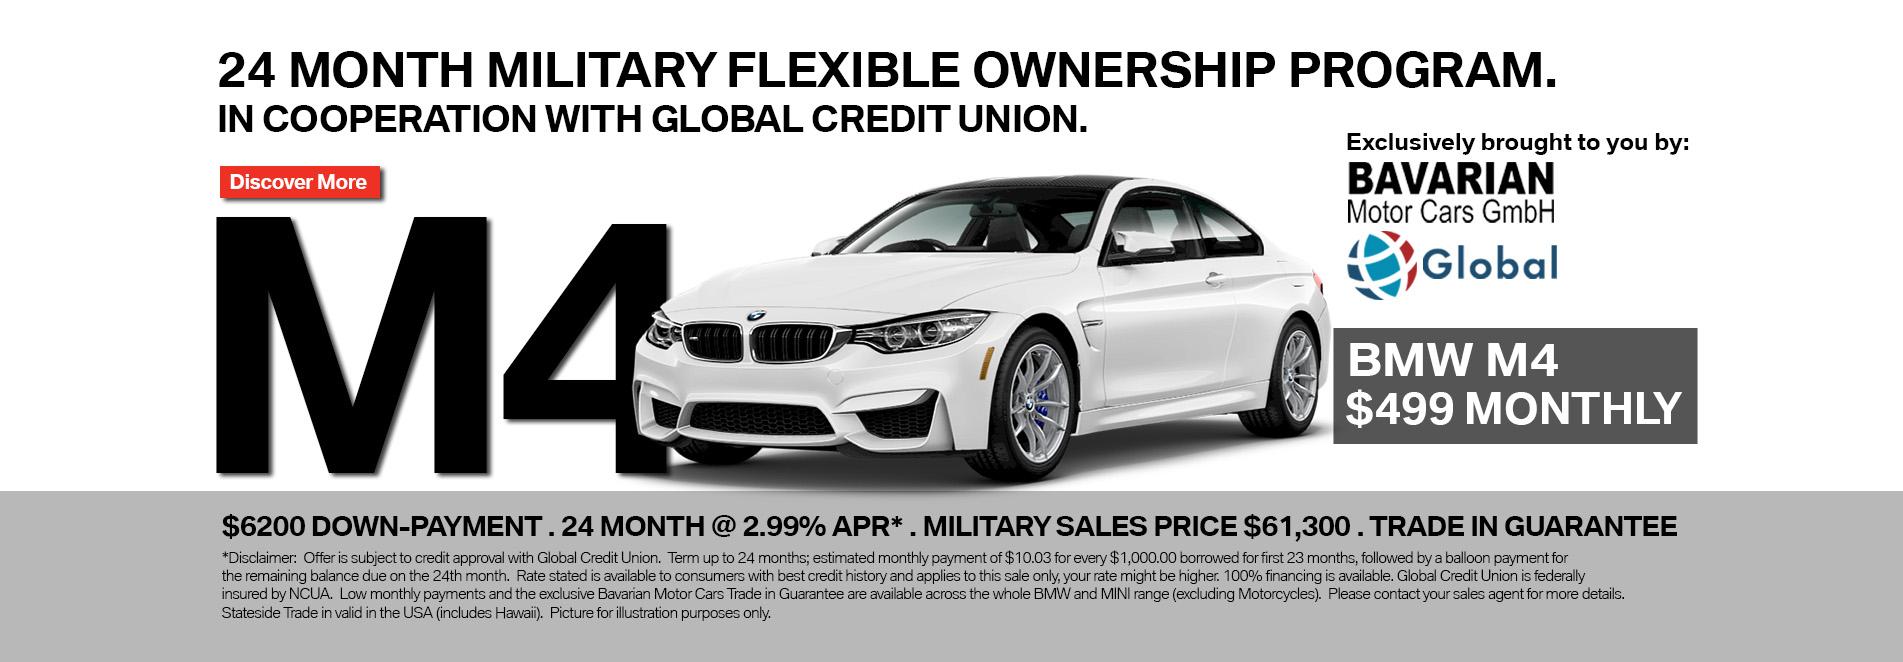 bmw tax free military sales bavarian motor cars germany. Black Bedroom Furniture Sets. Home Design Ideas